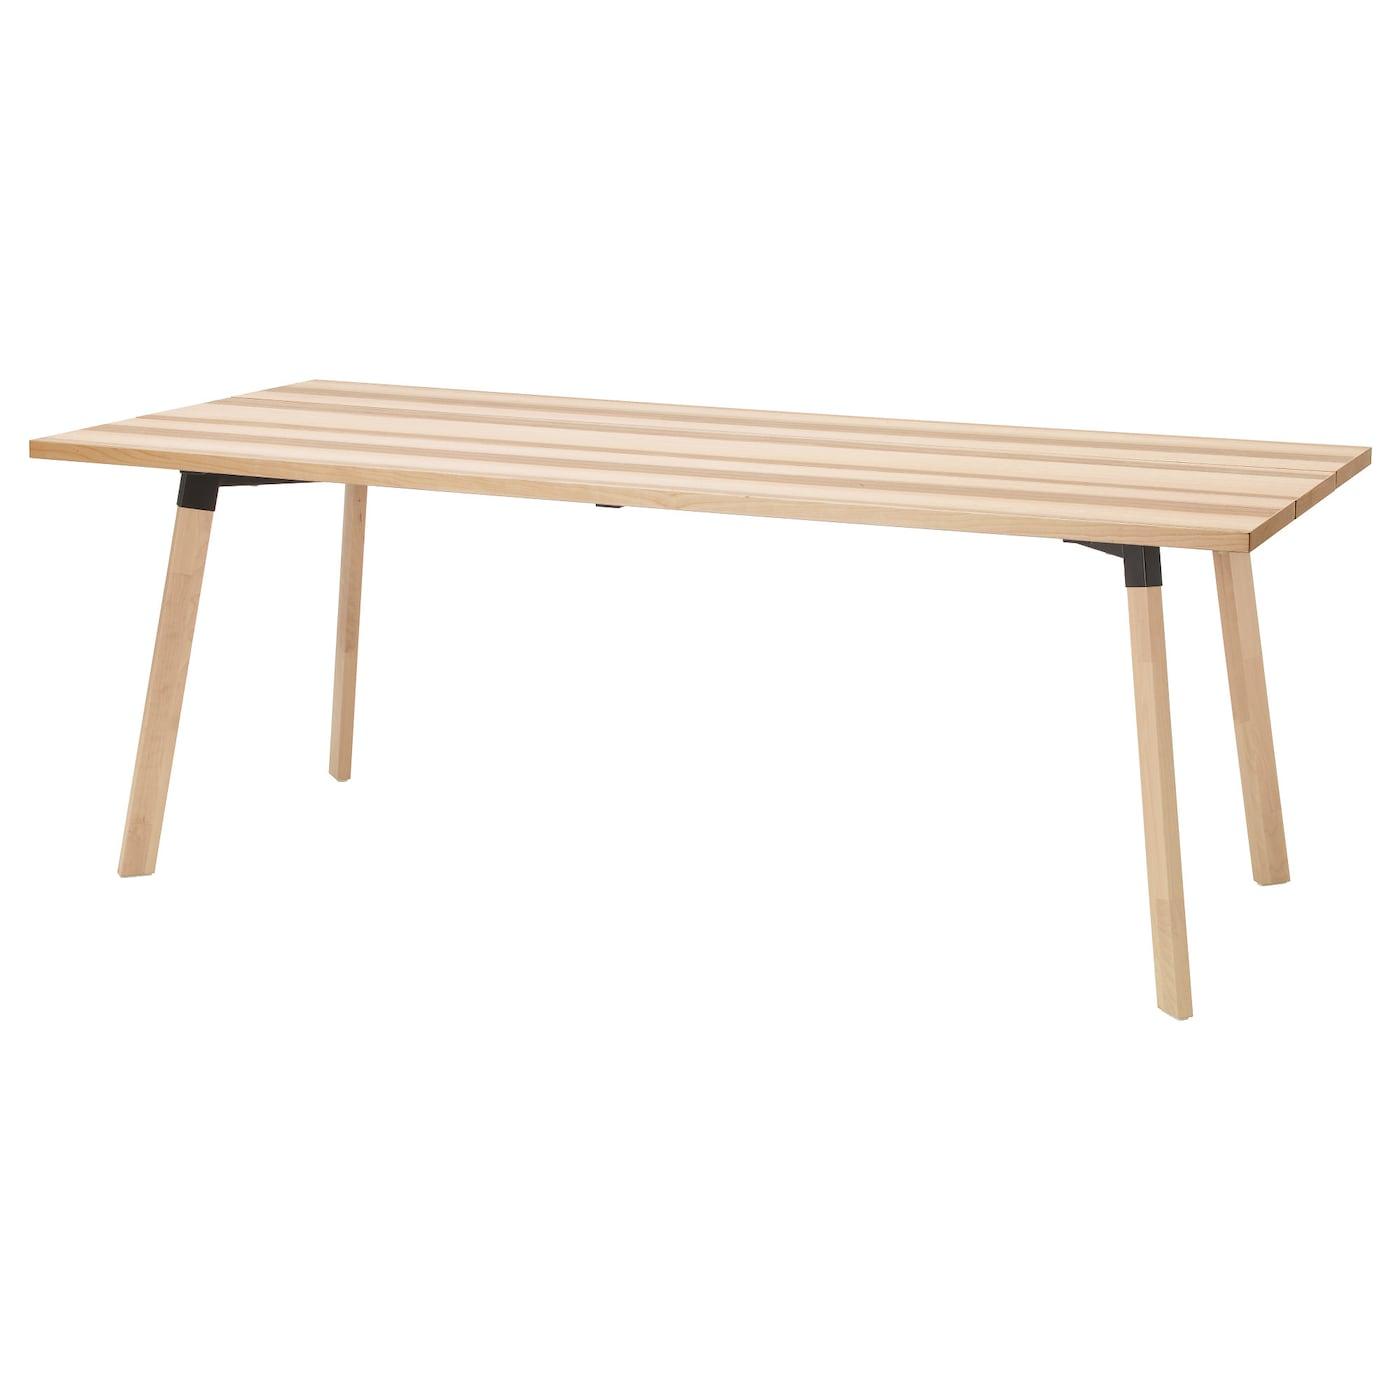 Ypperlig tafel essen 200 x 90 cm ikea for Ikea tafels